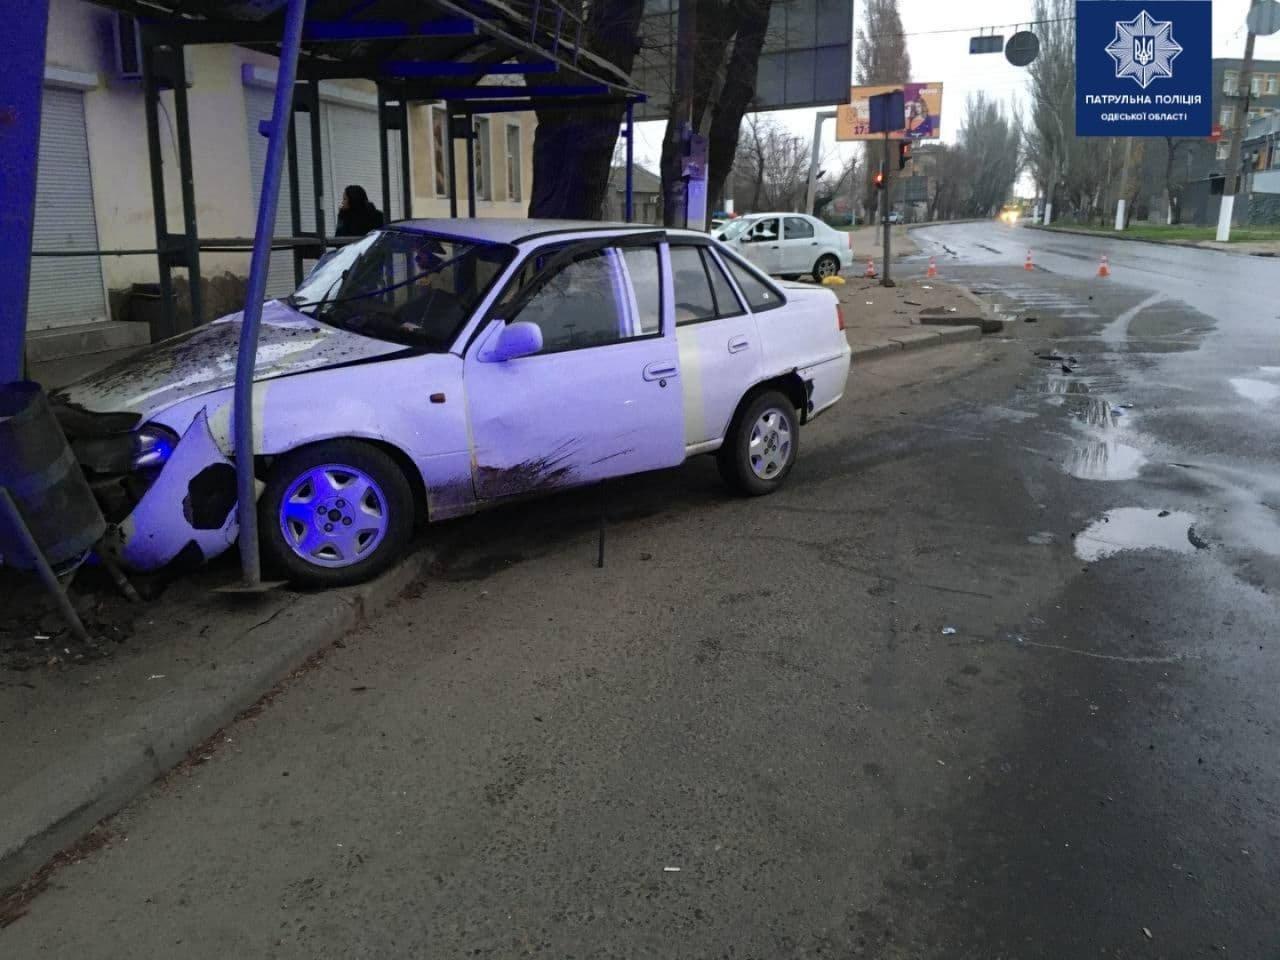 В Одессе по вине пьяного водителя в ДТП пострадали три человека, - ФОТО, фото-2